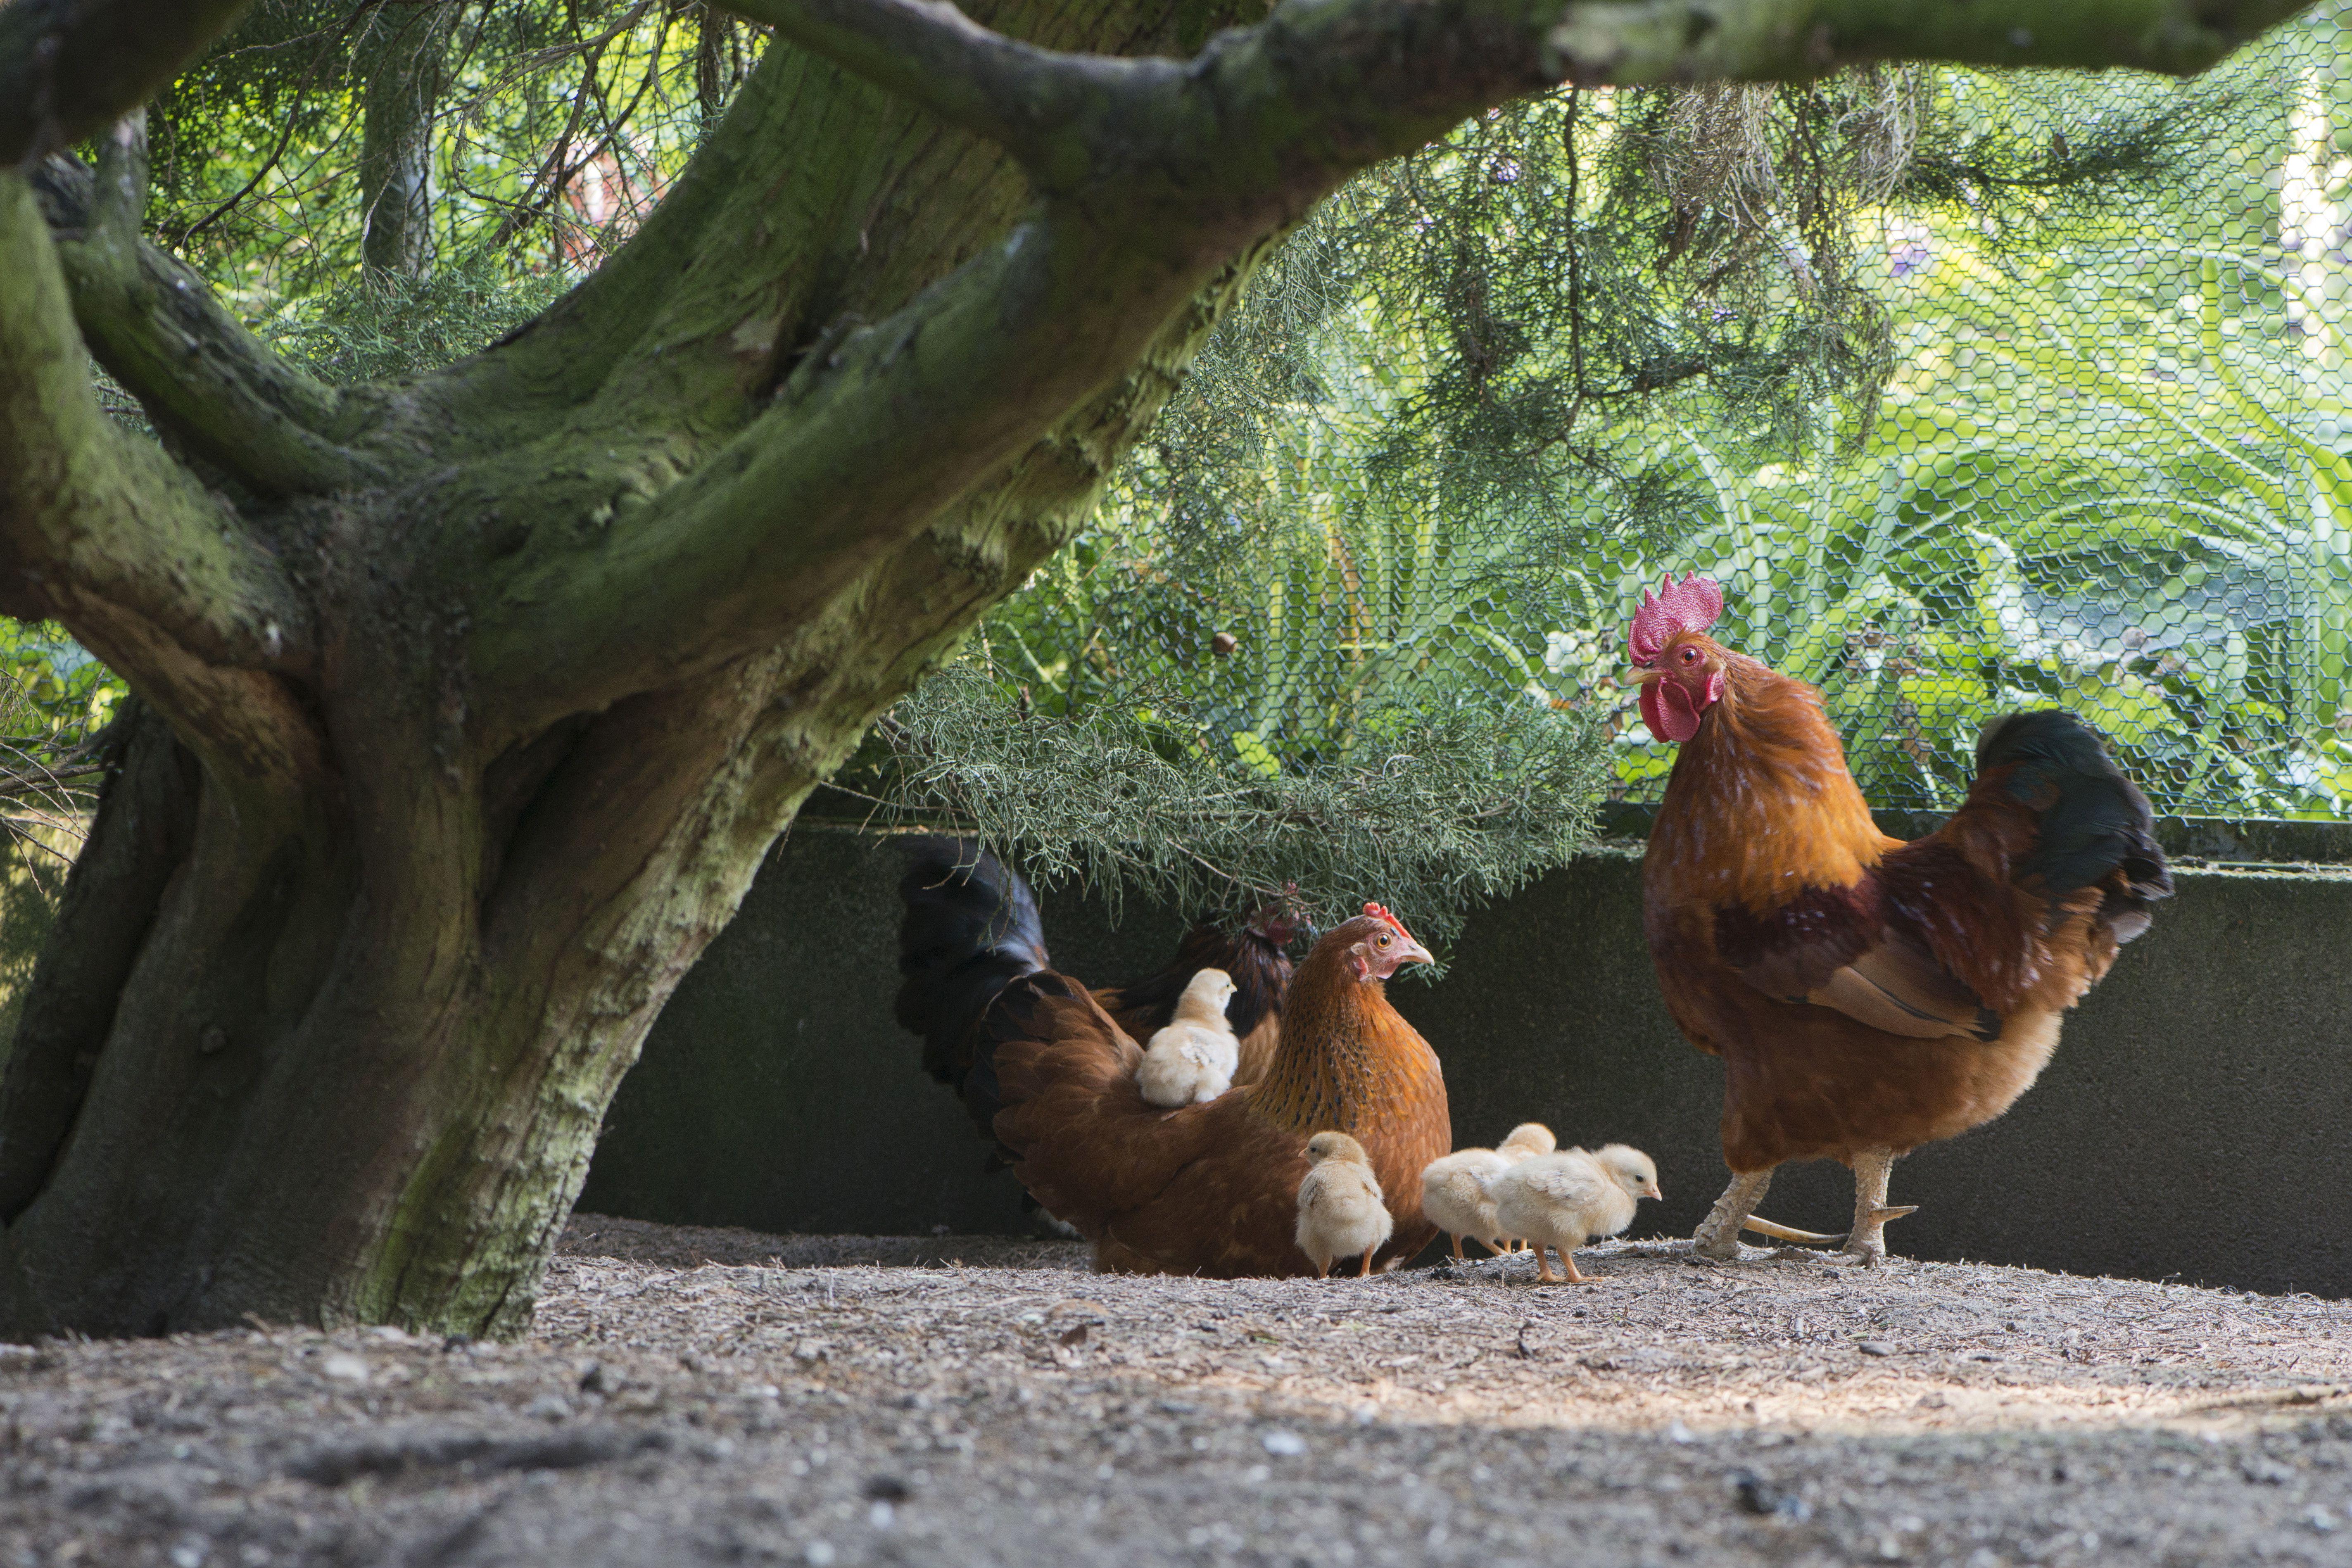 Dwarf New Hampshire, hen with chicks, Emsland, Lower Saxony, Germany, Europe